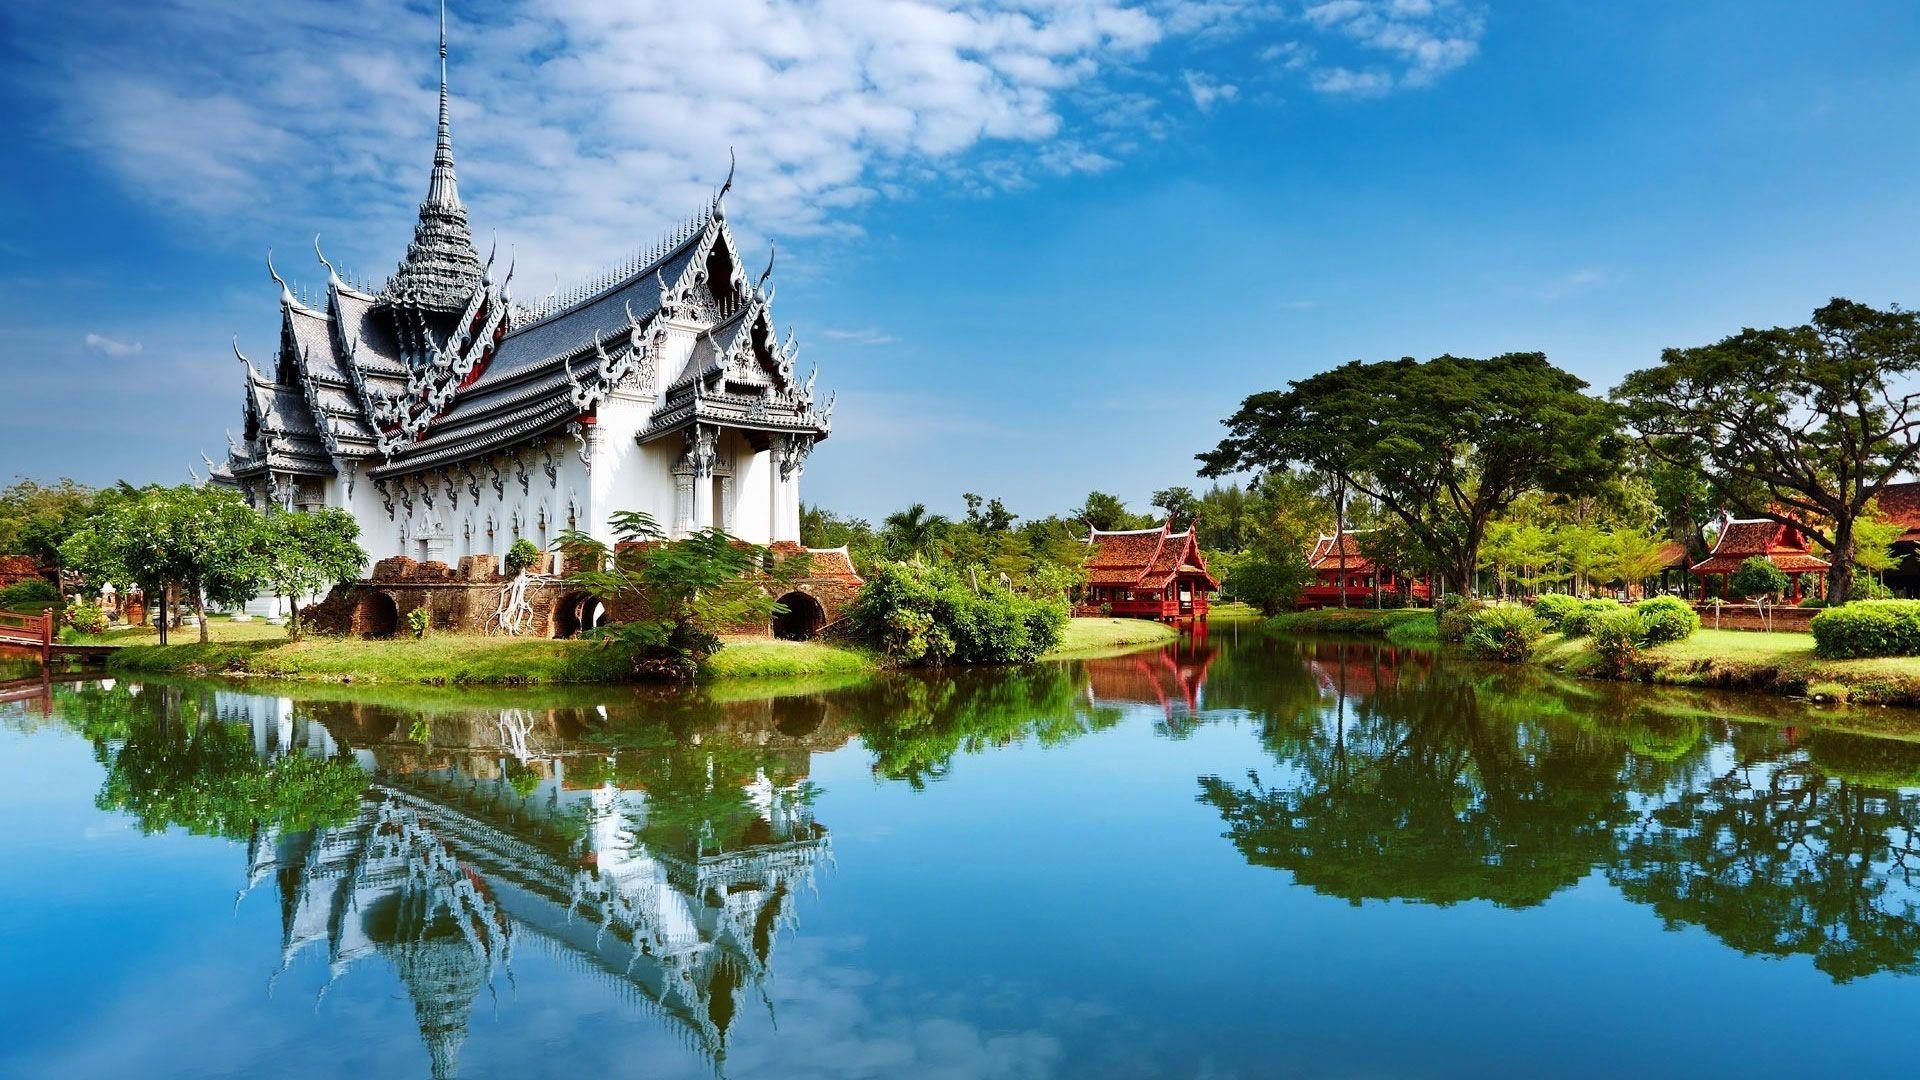 hd pics photos stunning attractive temple 25 hd desktop background wallpaper